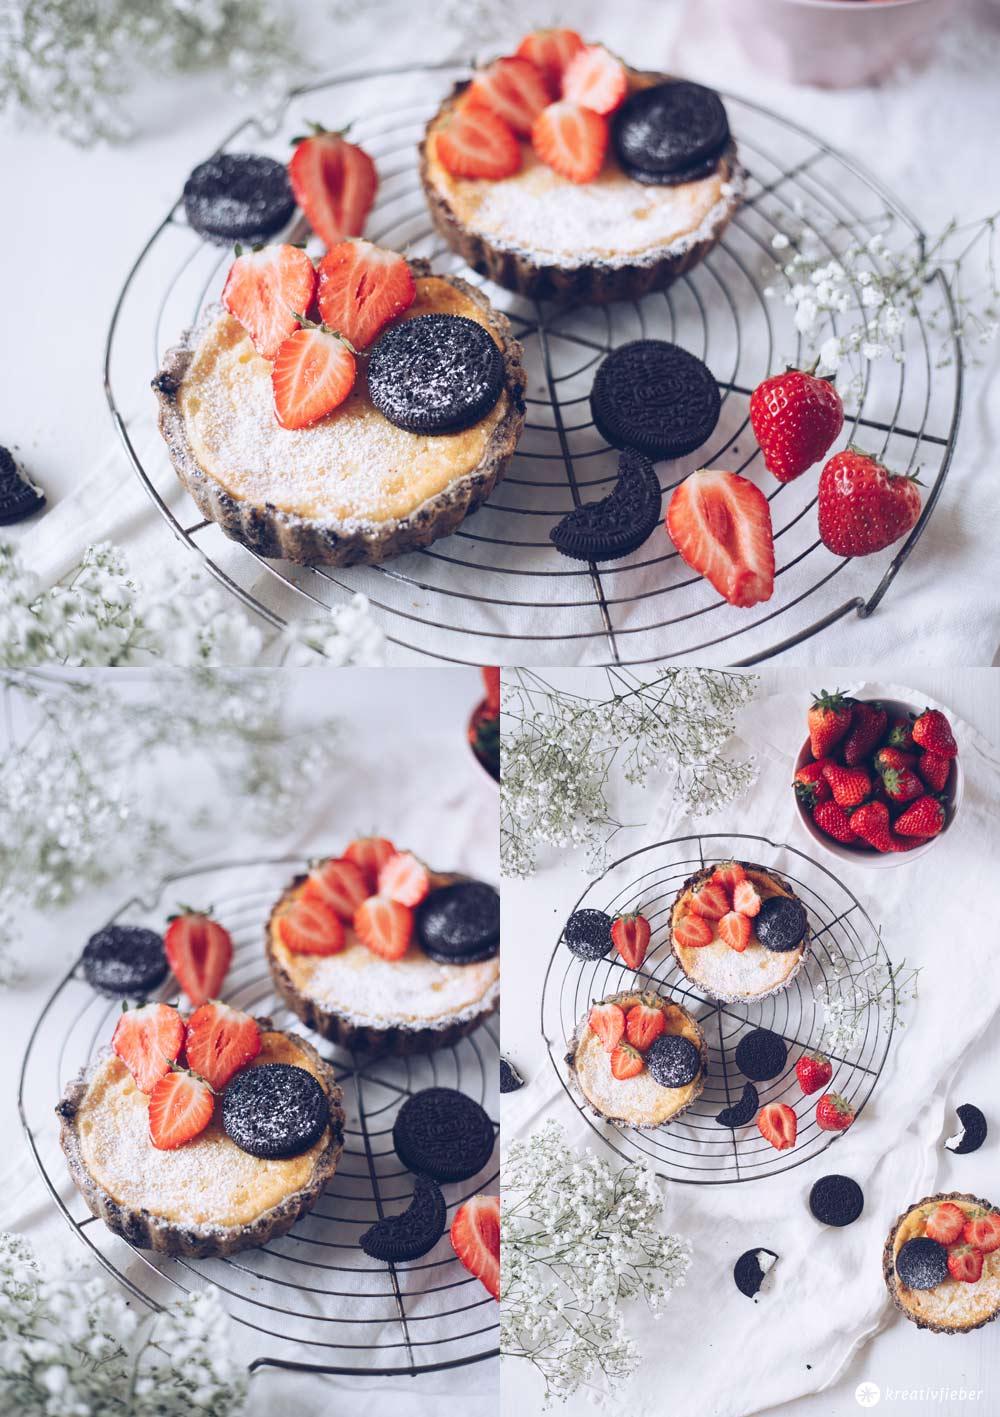 Erdbeer-Cheesecake-Törtchen mit Oreo-Knusperboden - Rezepidee mit Erdbeeren - Beerensaison Rezepte